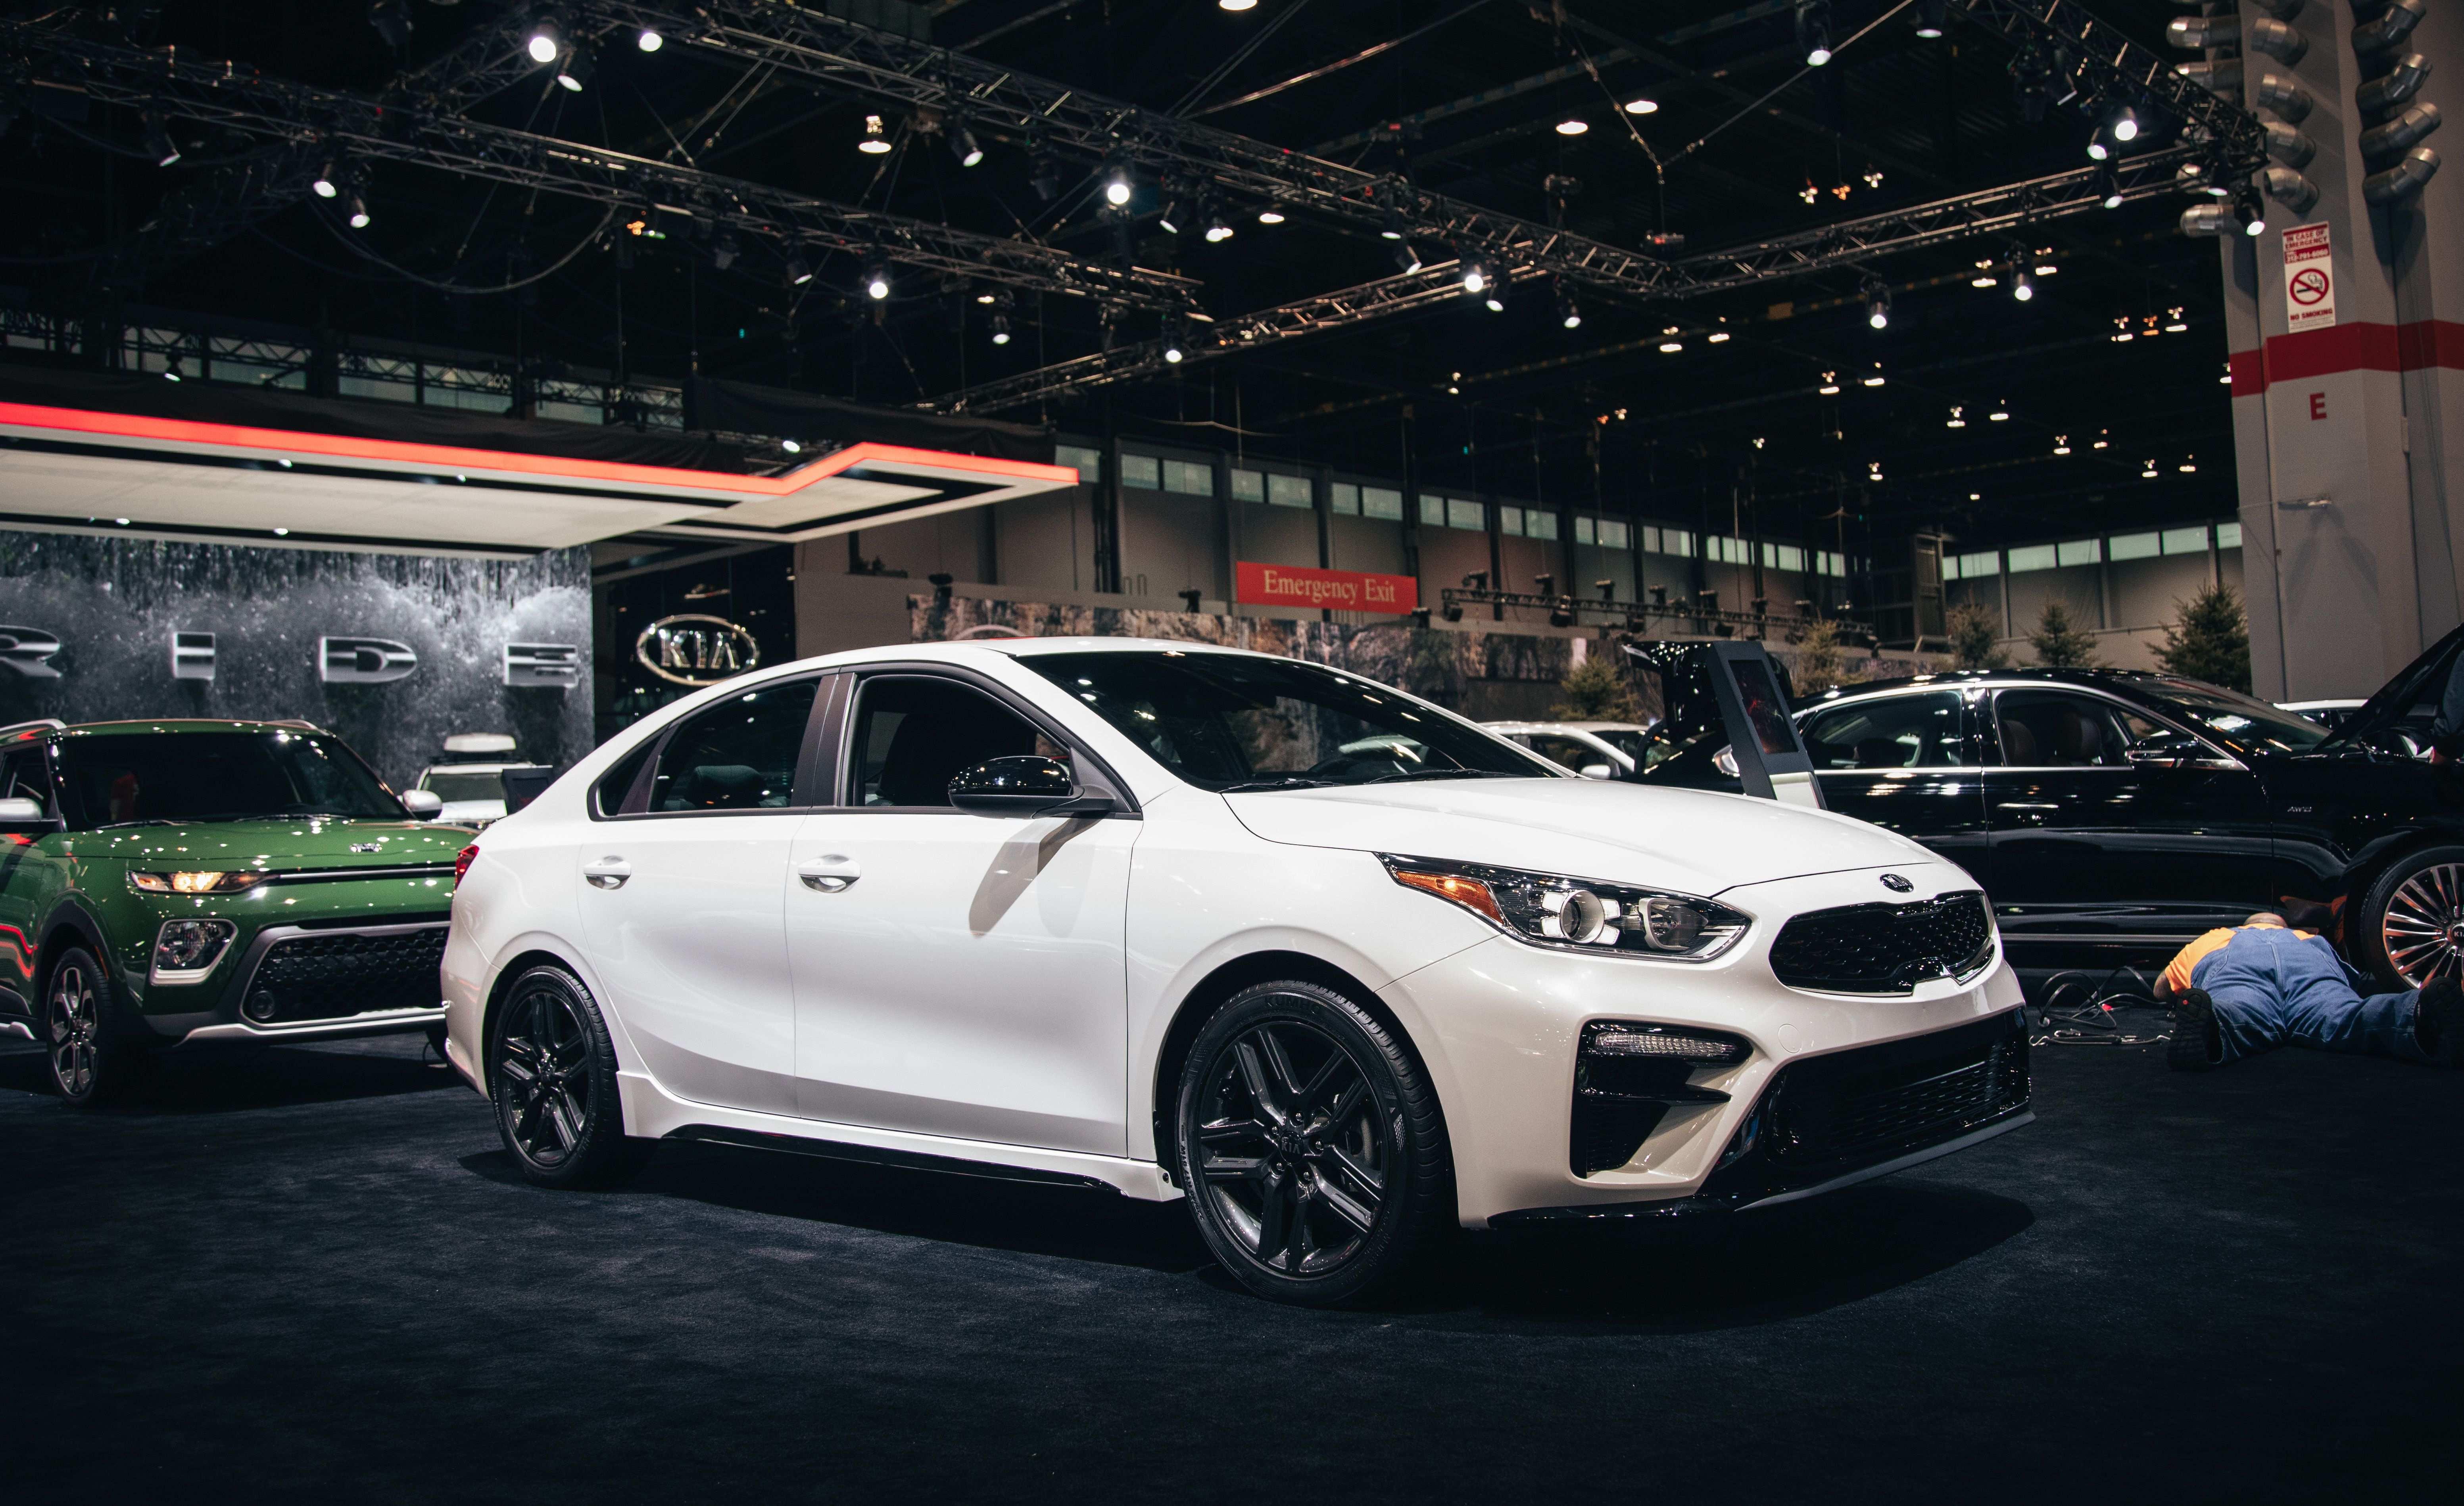 55 New Kia Forte Hatchback 2020 Rumors with Kia Forte Hatchback 2020